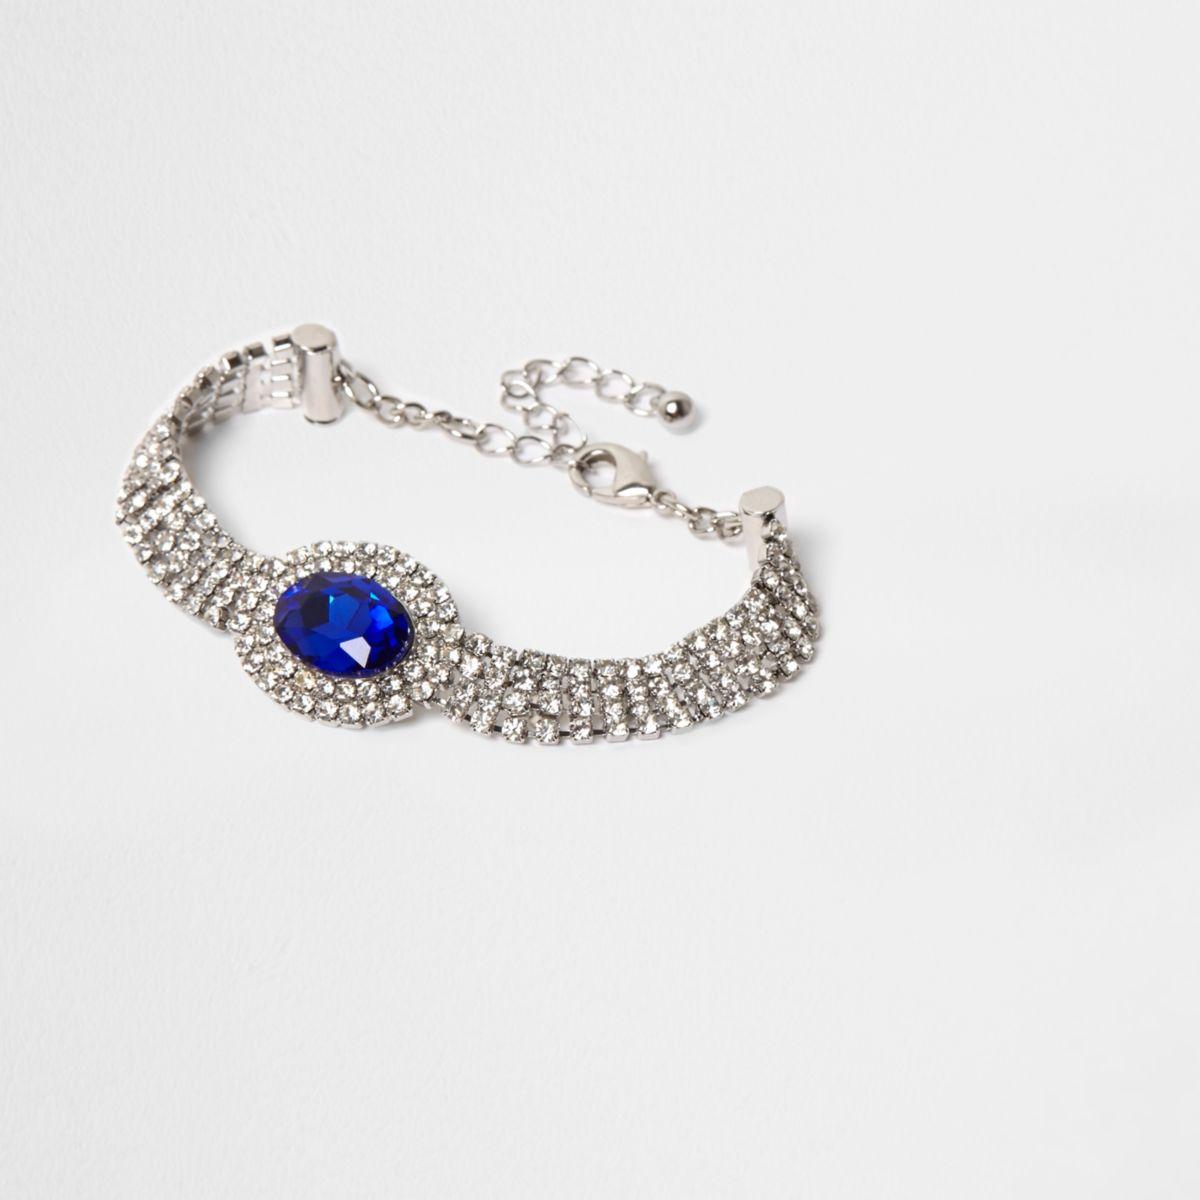 Silver tone sapphire oval jewel choker